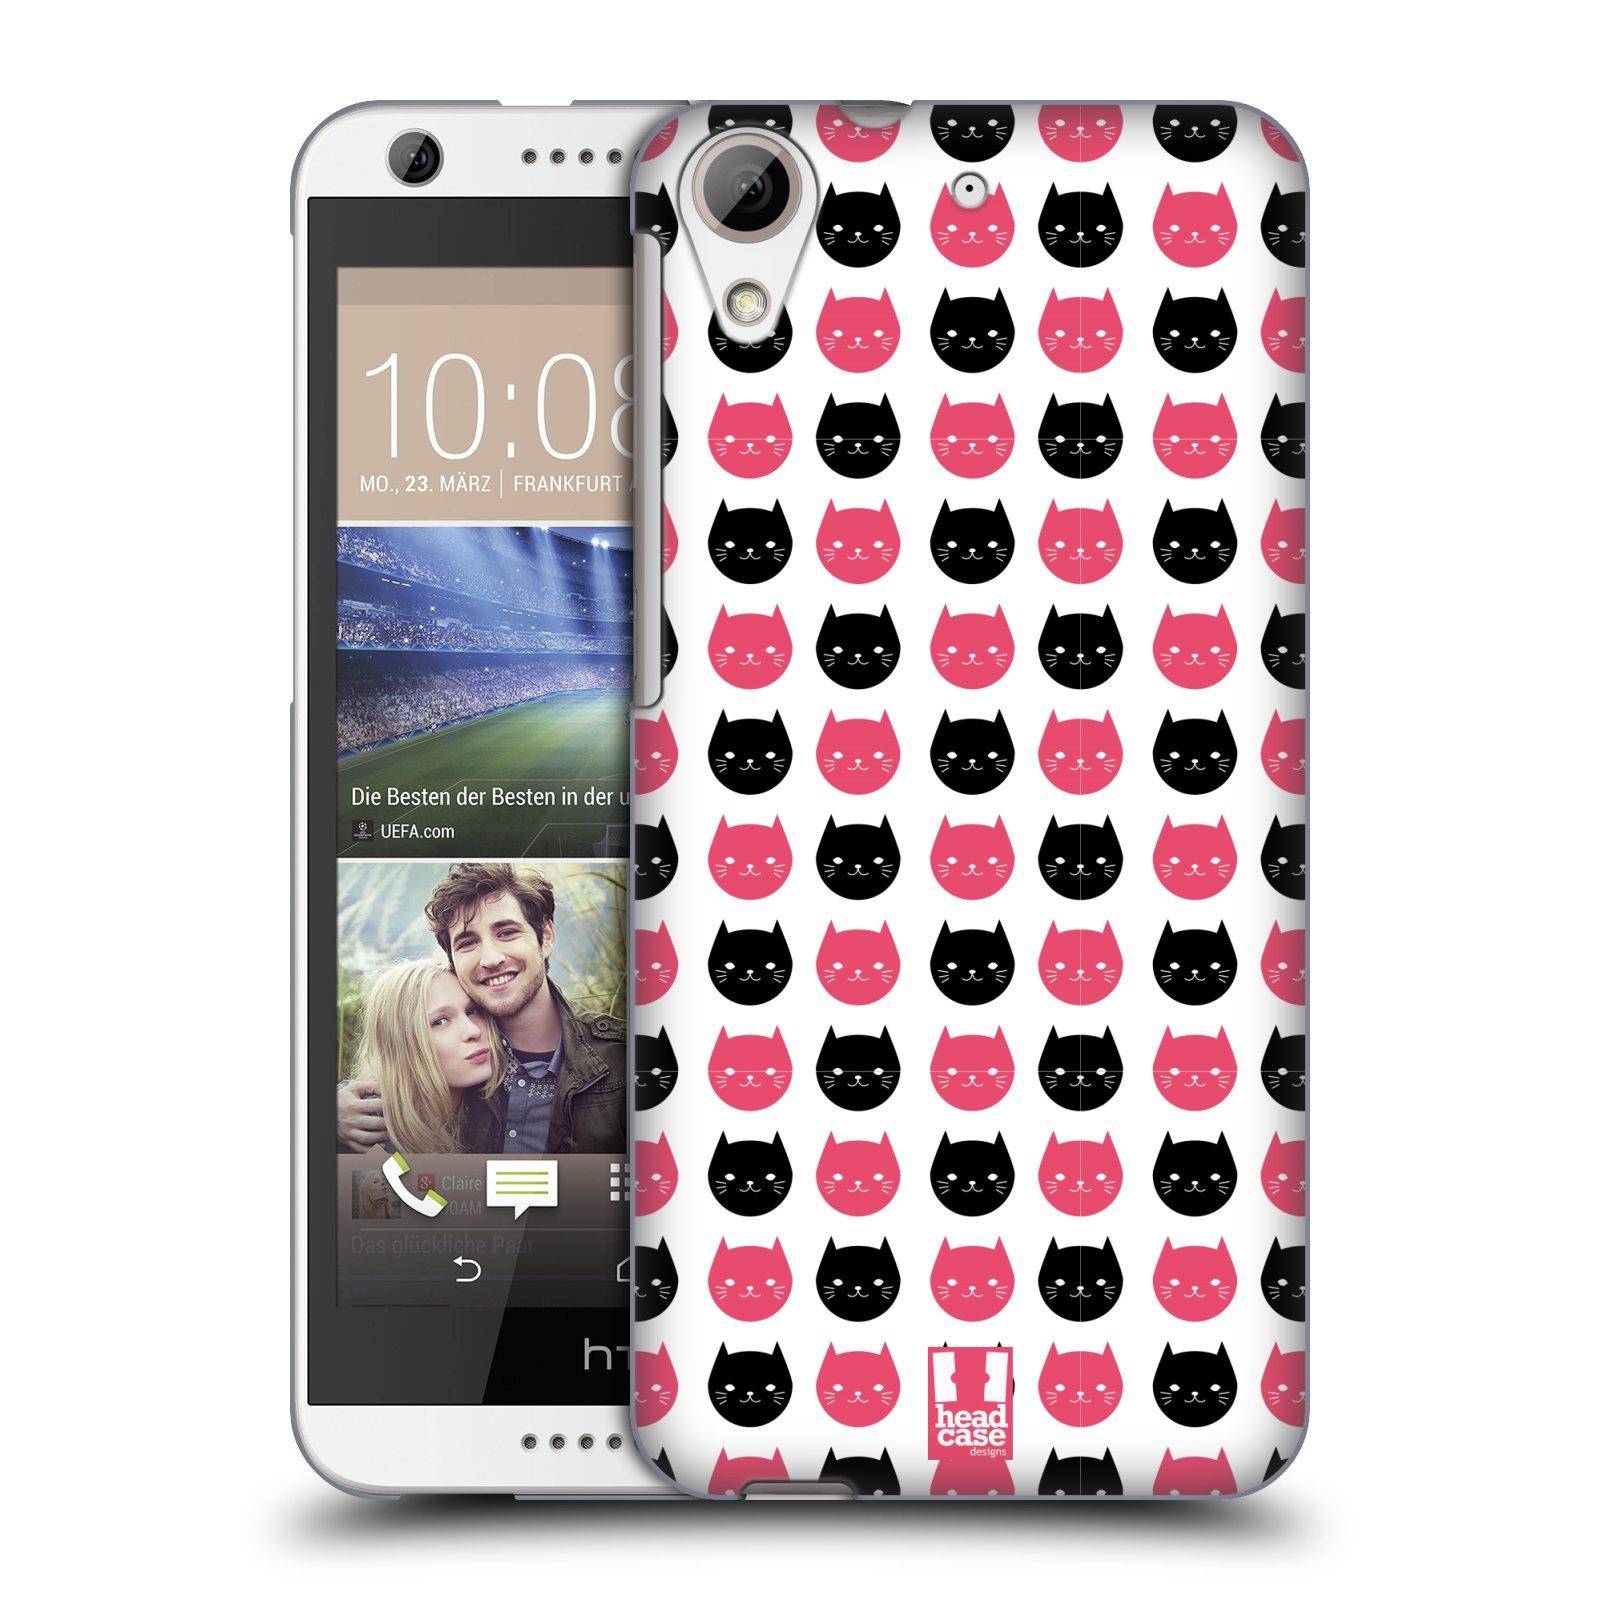 Plastové pouzdro na mobil HTC Desire 626 / 626G HEAD CASE KOČKY Black and Pink (Kryt či obal na mobilní telefon HTC Desire 626G Dual SIM a HTC Desire 626)